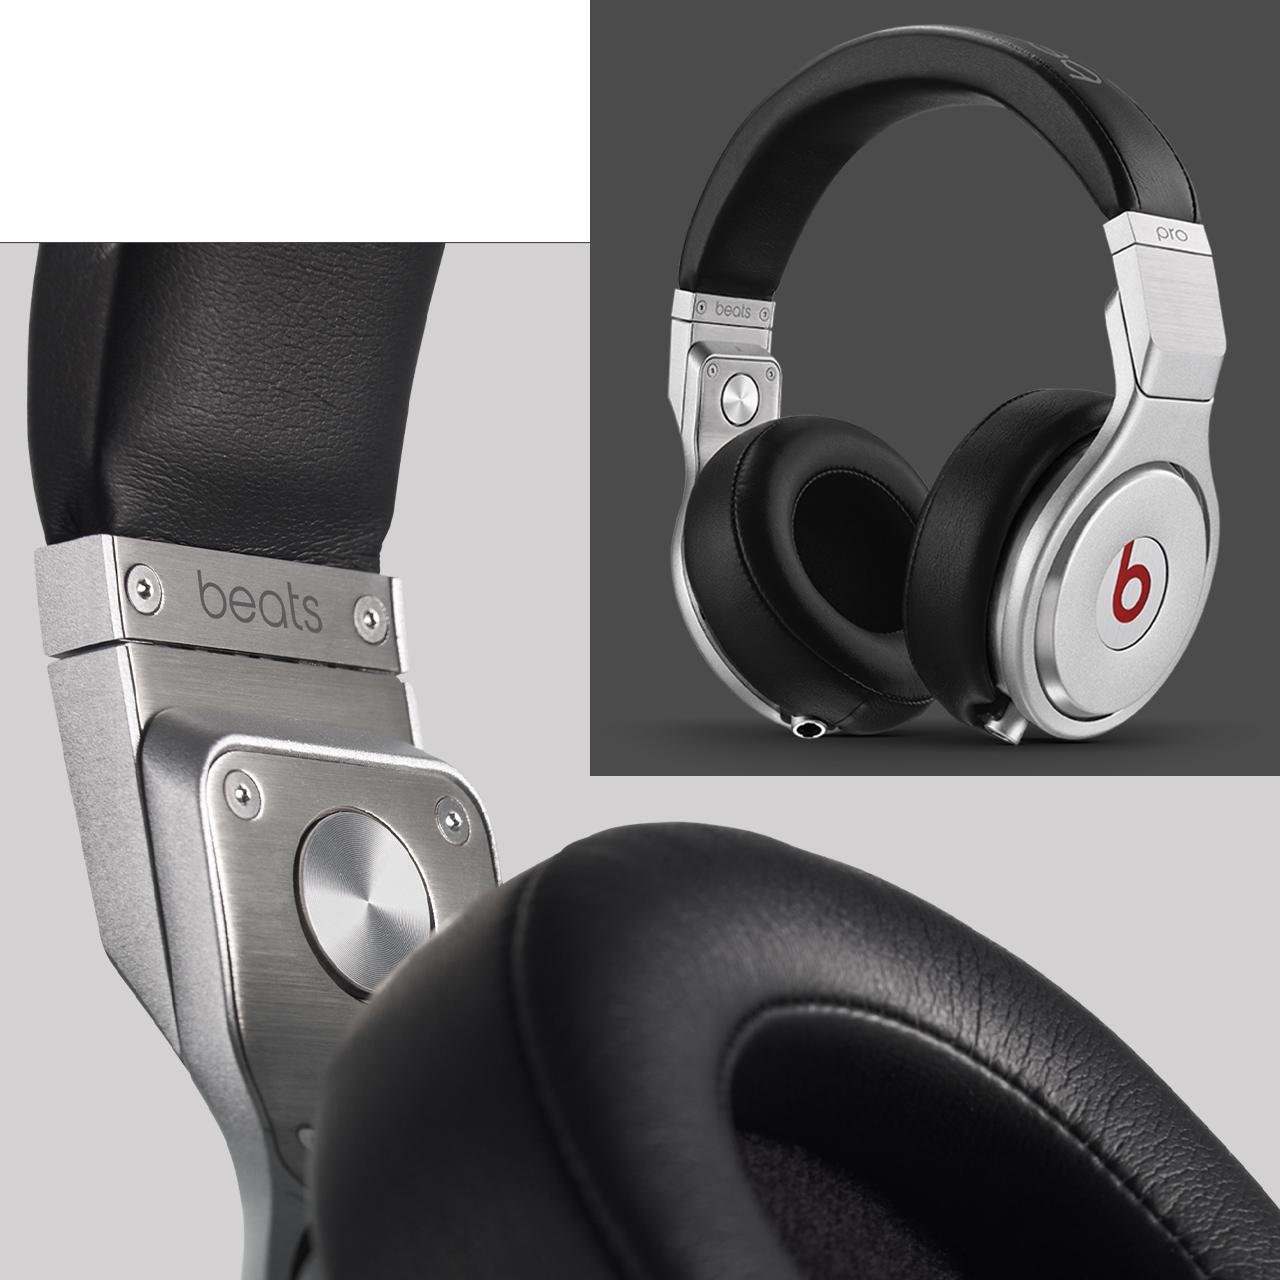 Beats Pro Headphones Support Beats By Dre